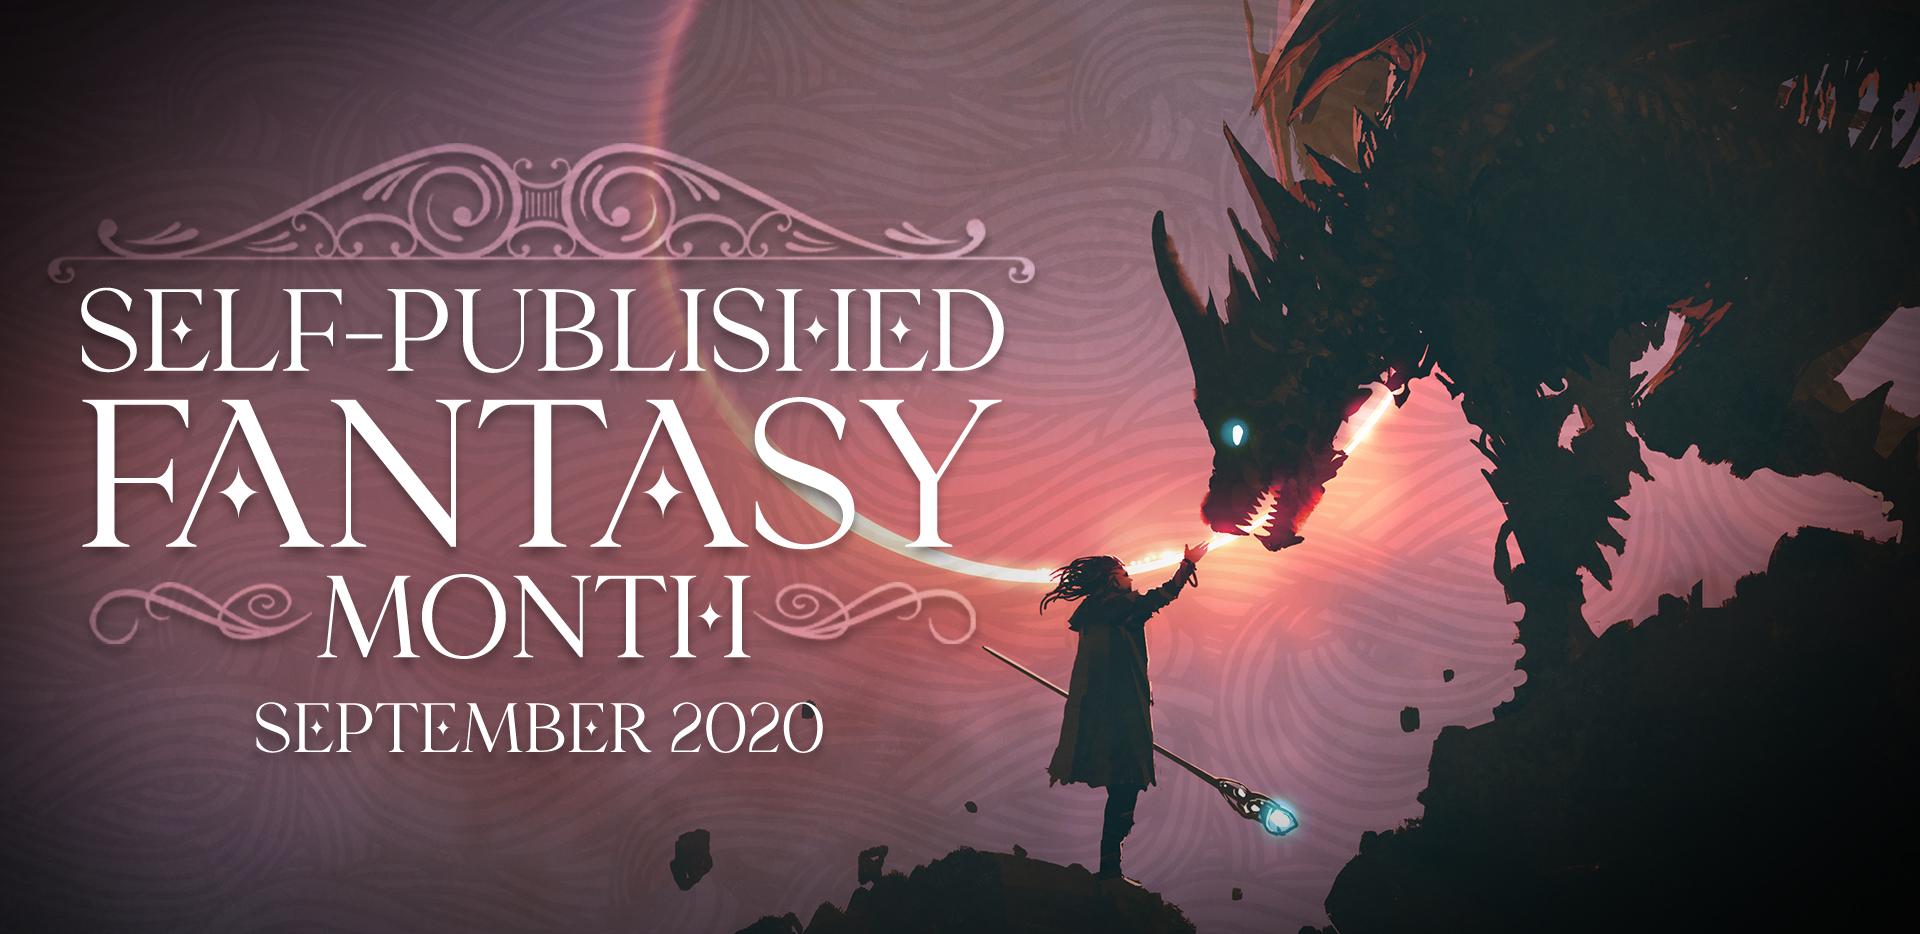 self-published fantasy month